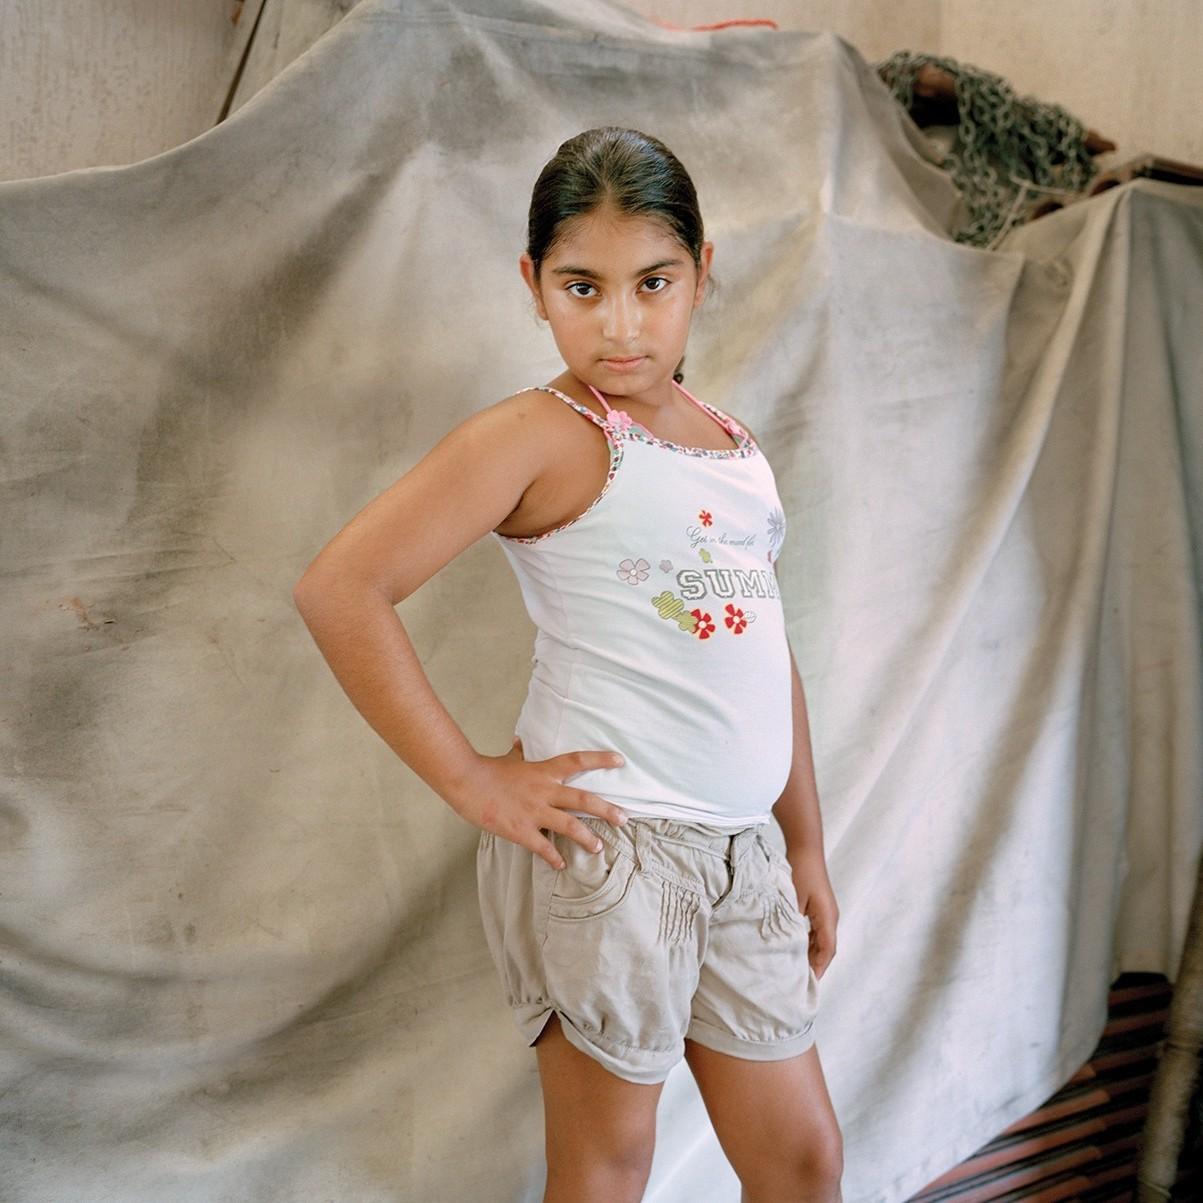 Rania Matar Captures The Universal Awkwardness Of Coming